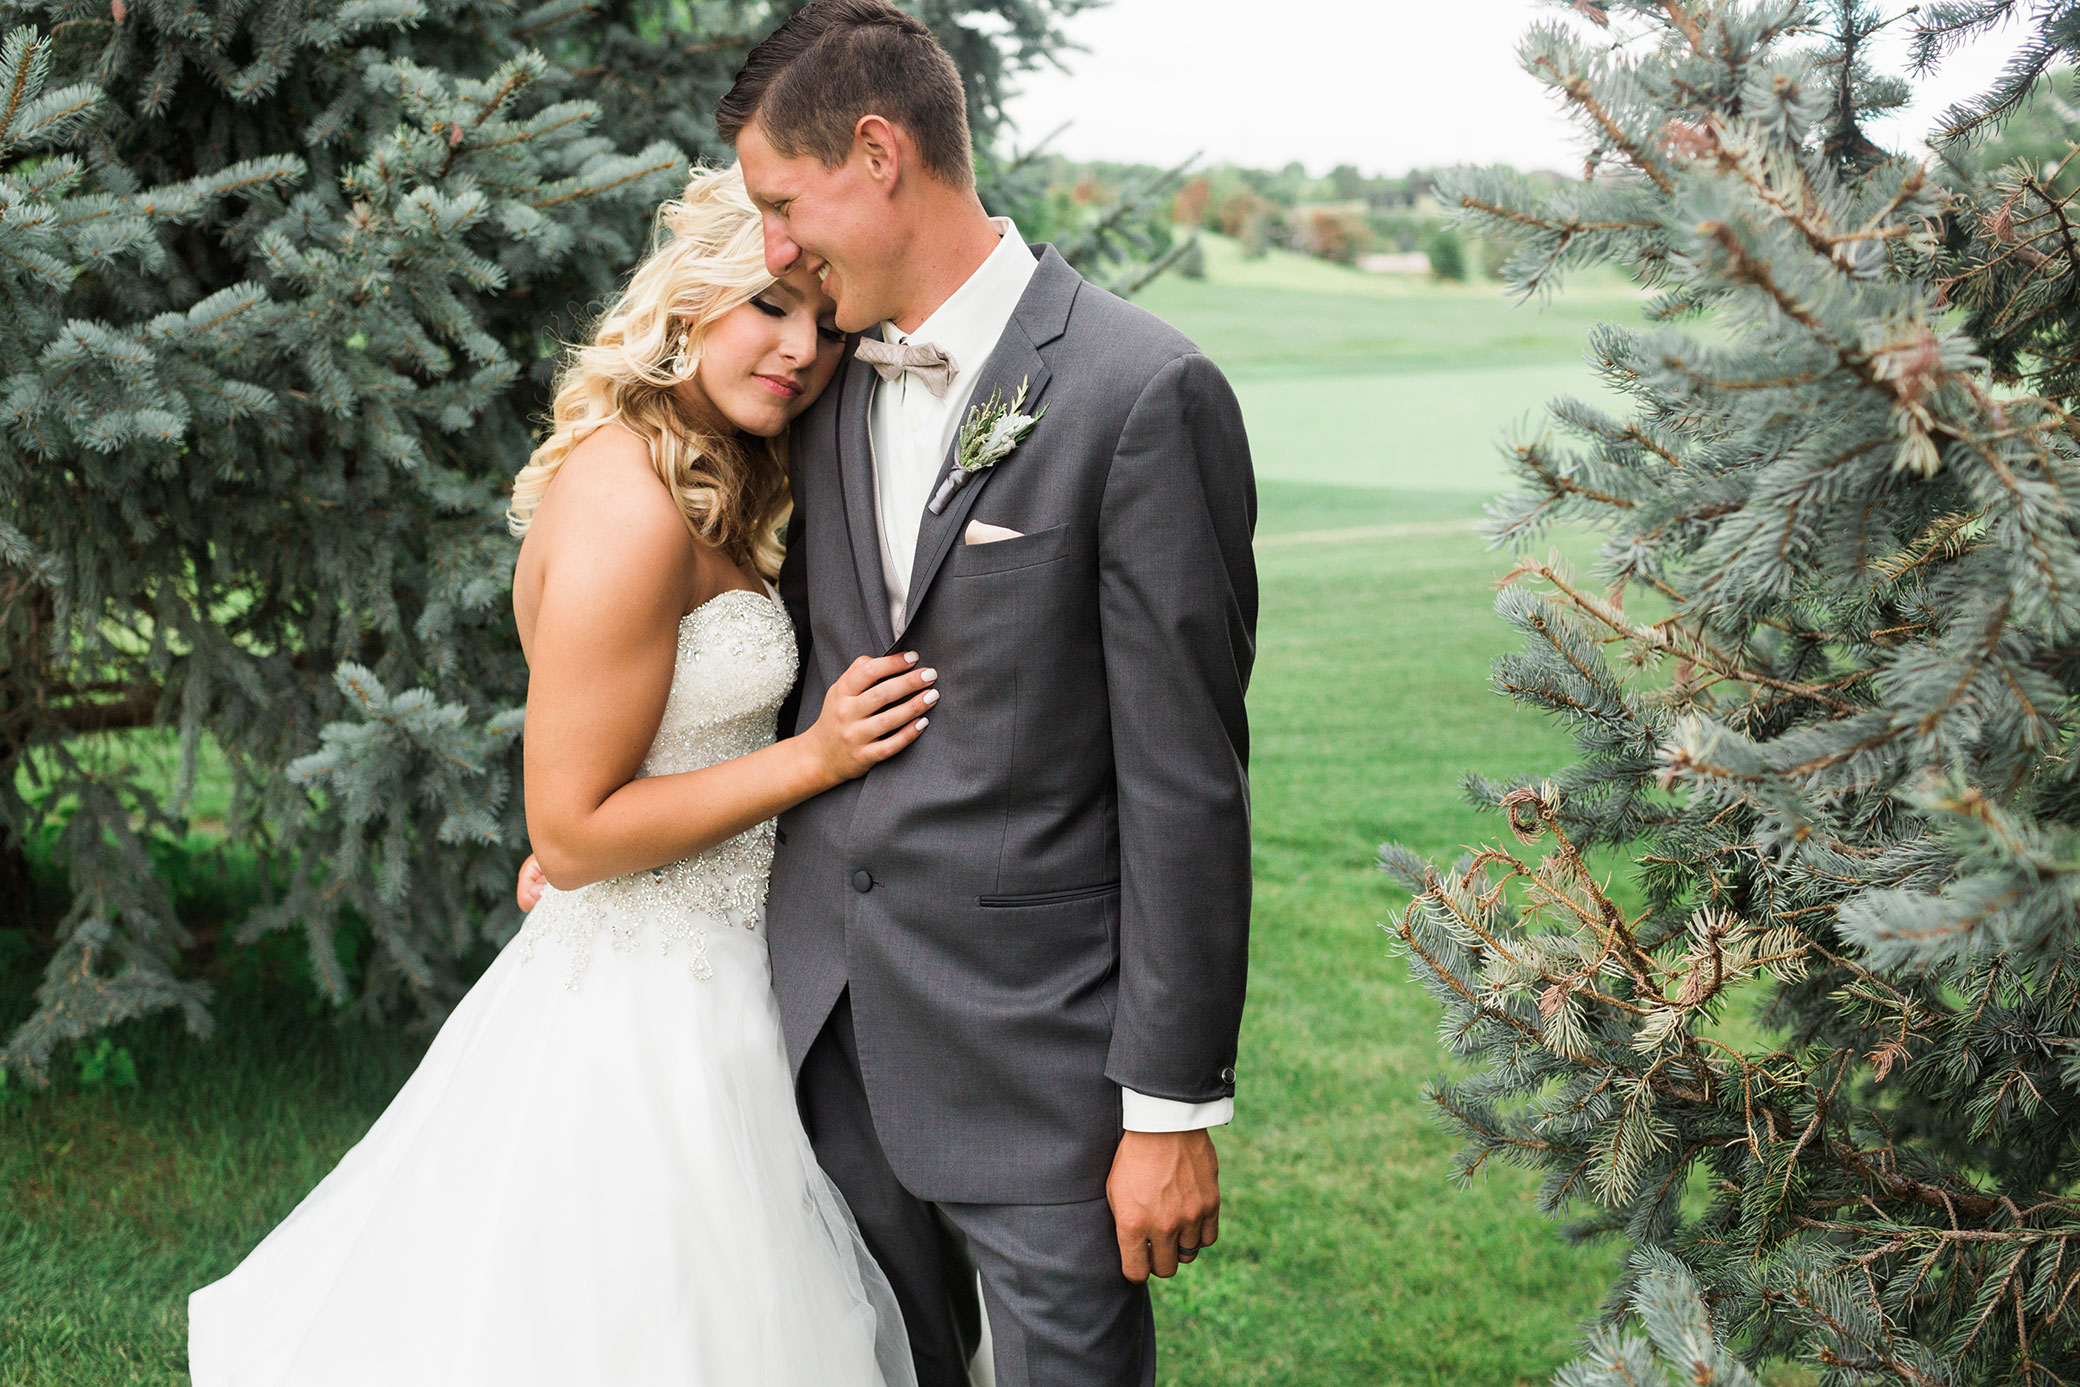 Indian_Creek_Country_Club_Omaha_Wedding_Danielle_Paul-373.jpg